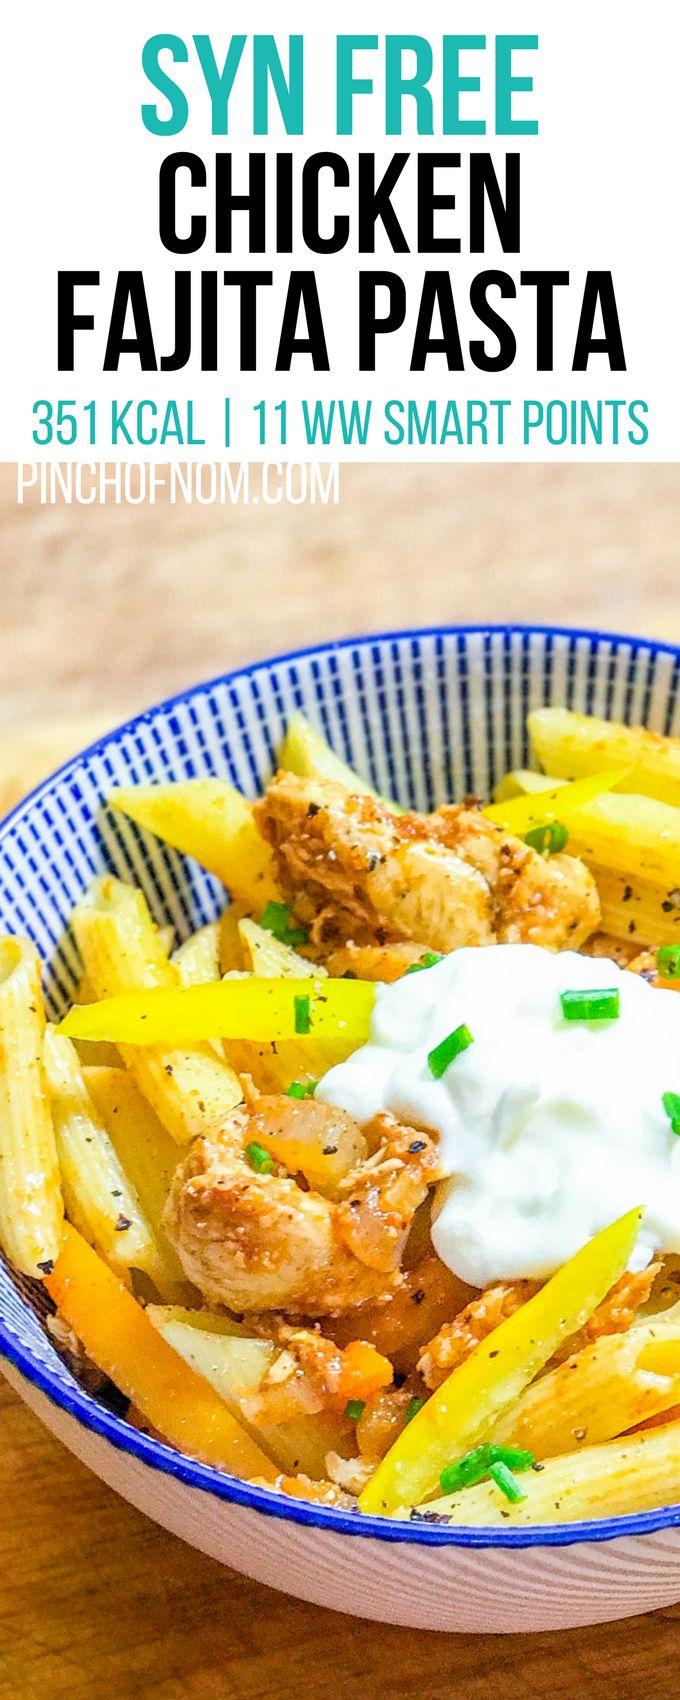 Syn Free Chicken Fajita Pasta | Pinch Of Nom Slimming World Recipes 351 kcal | Syn Free | 11 Weight Watchers Smart Points